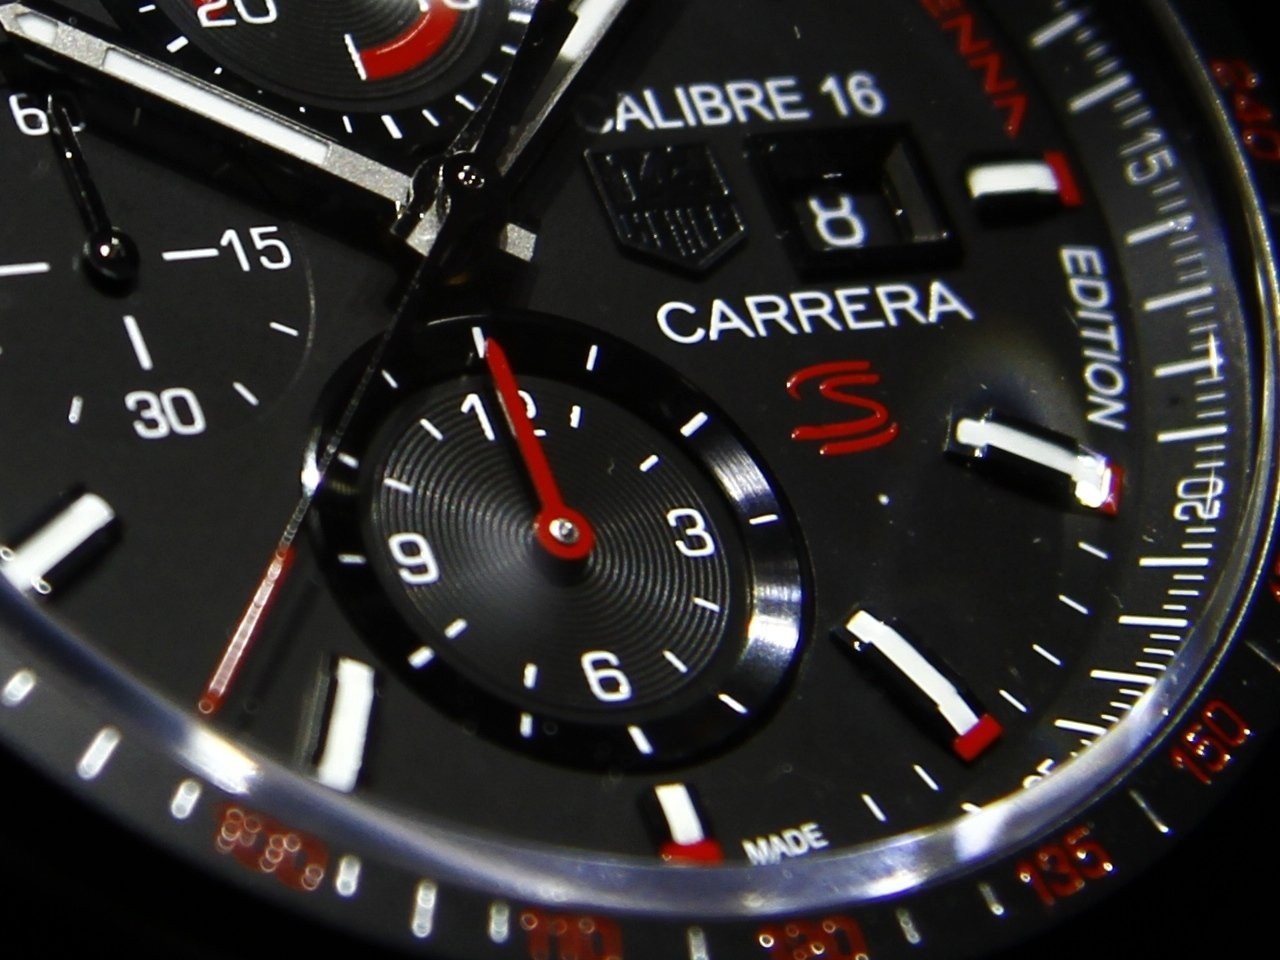 baselworld_2015-tag-heuer-calibre-16-chronograph-special-edition-senna-0-100_8